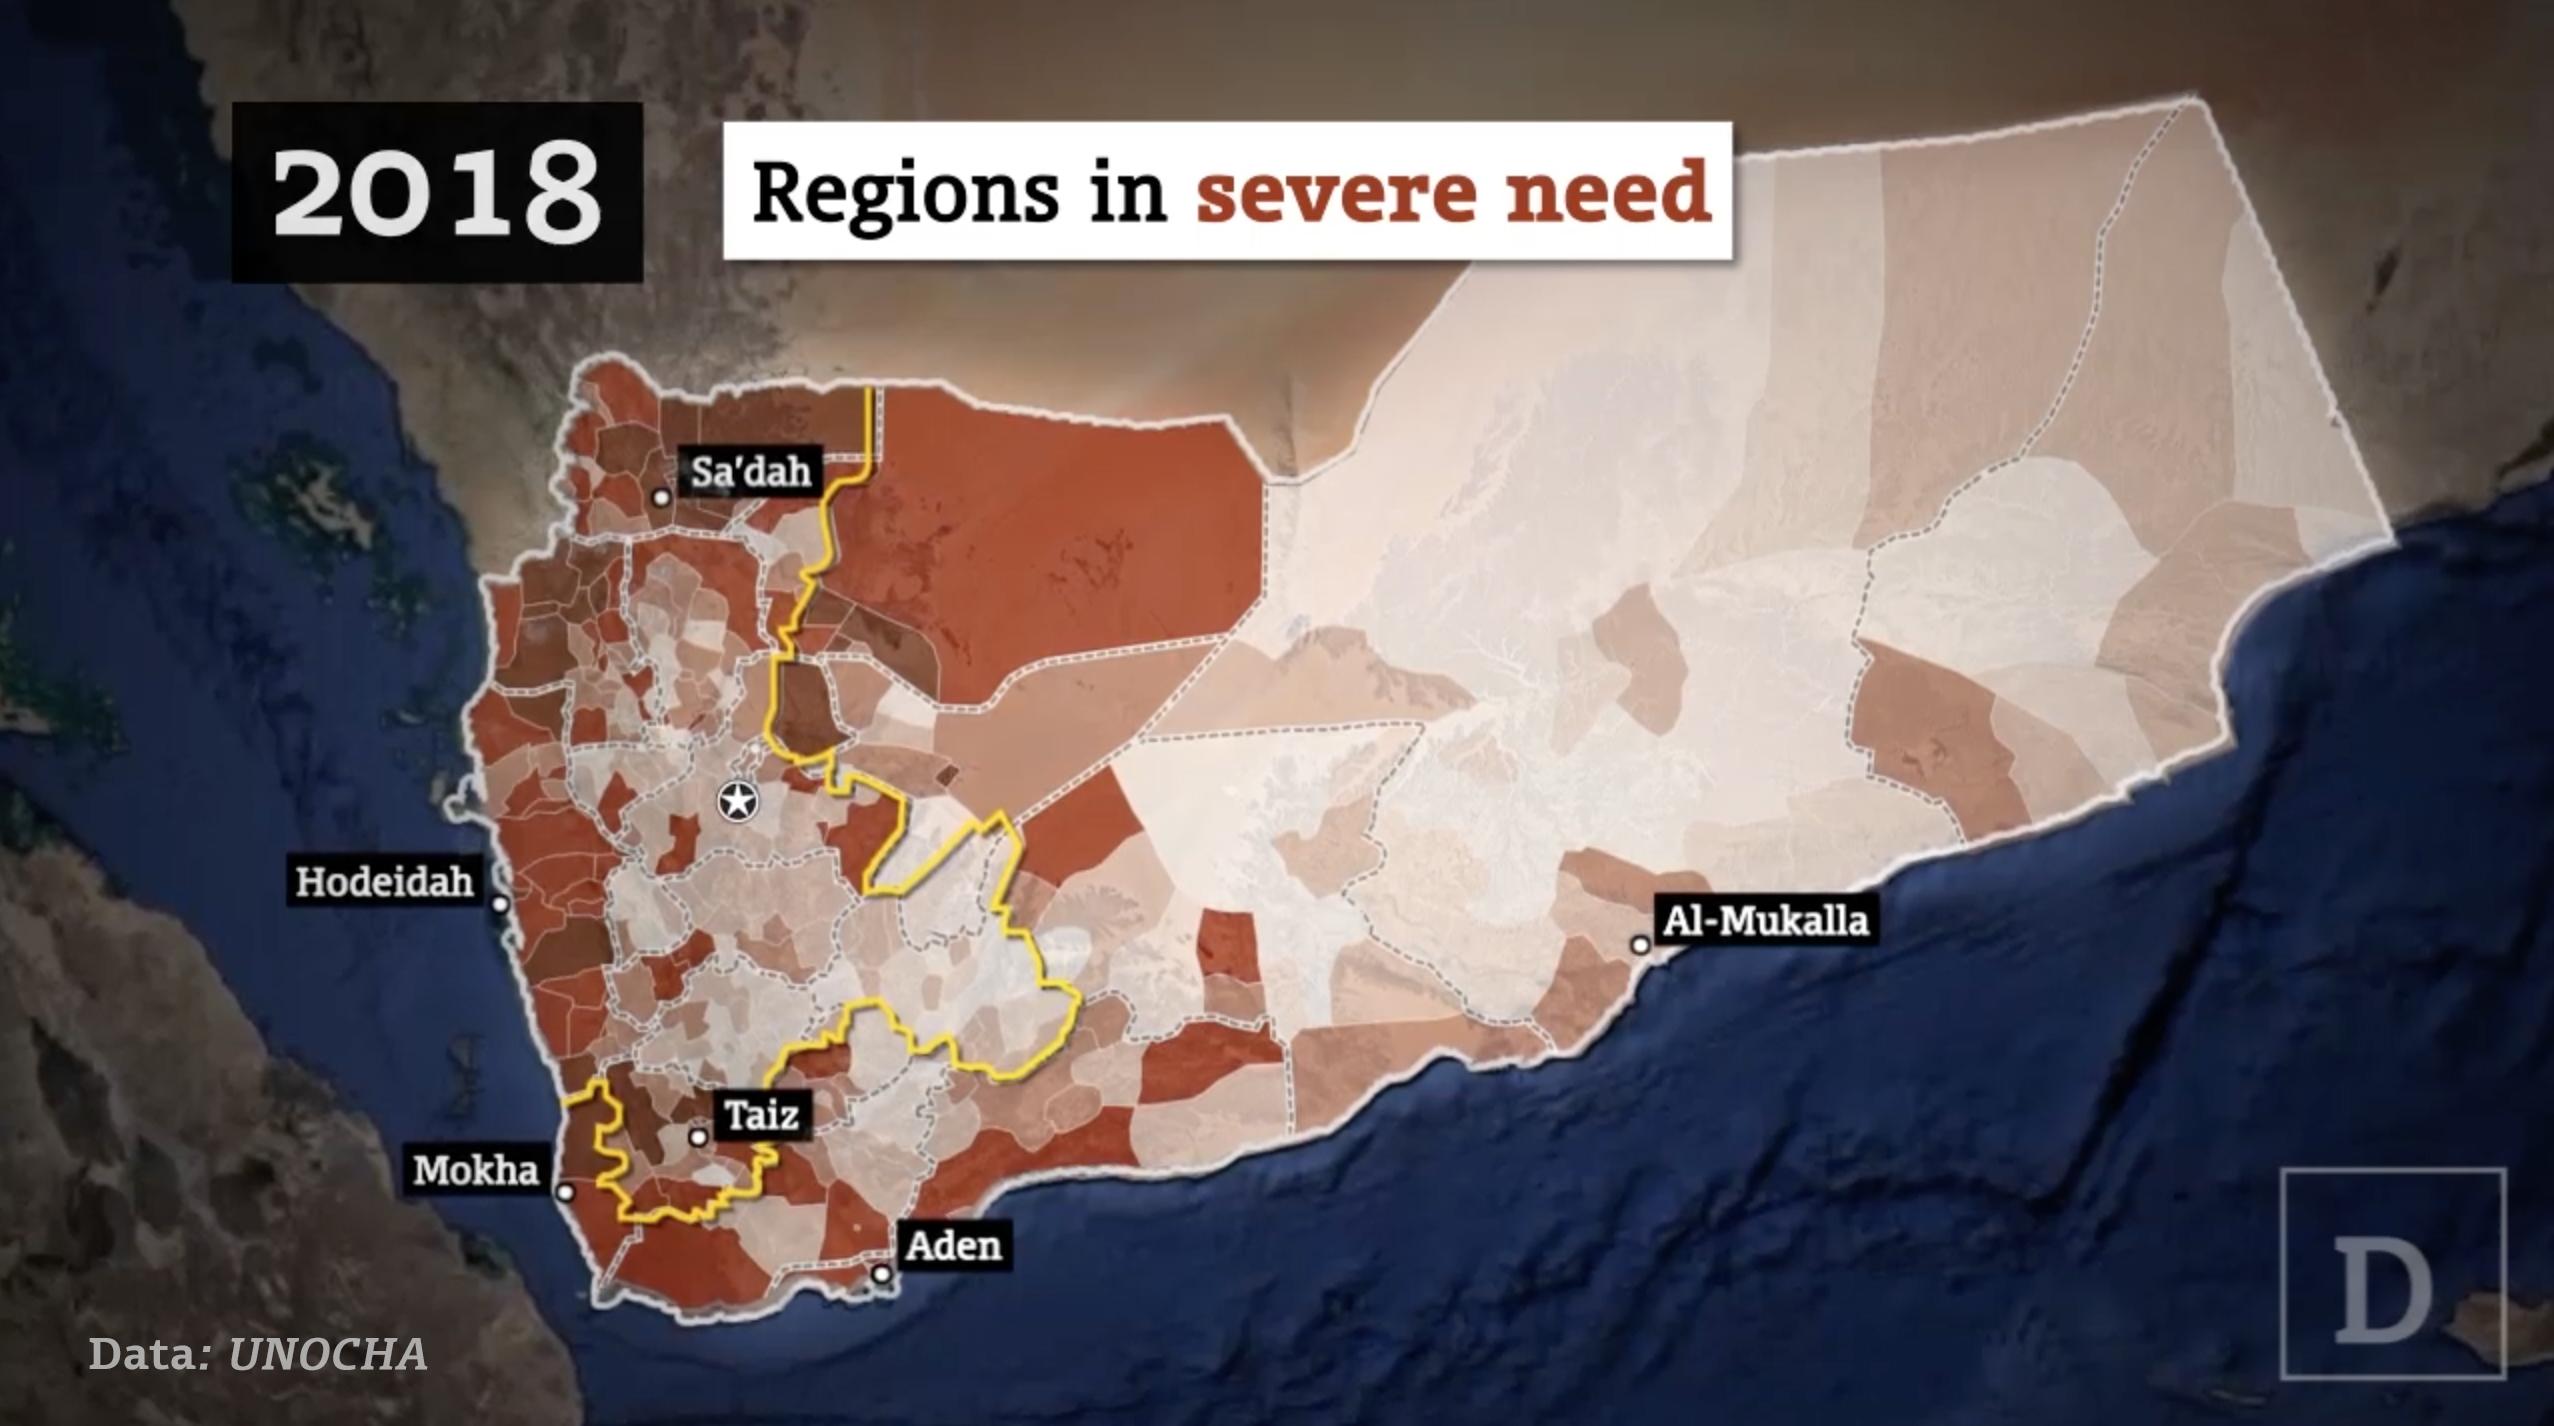 https://cdn.defenseone.com/media/featured/yemen_severe_needs.jpg